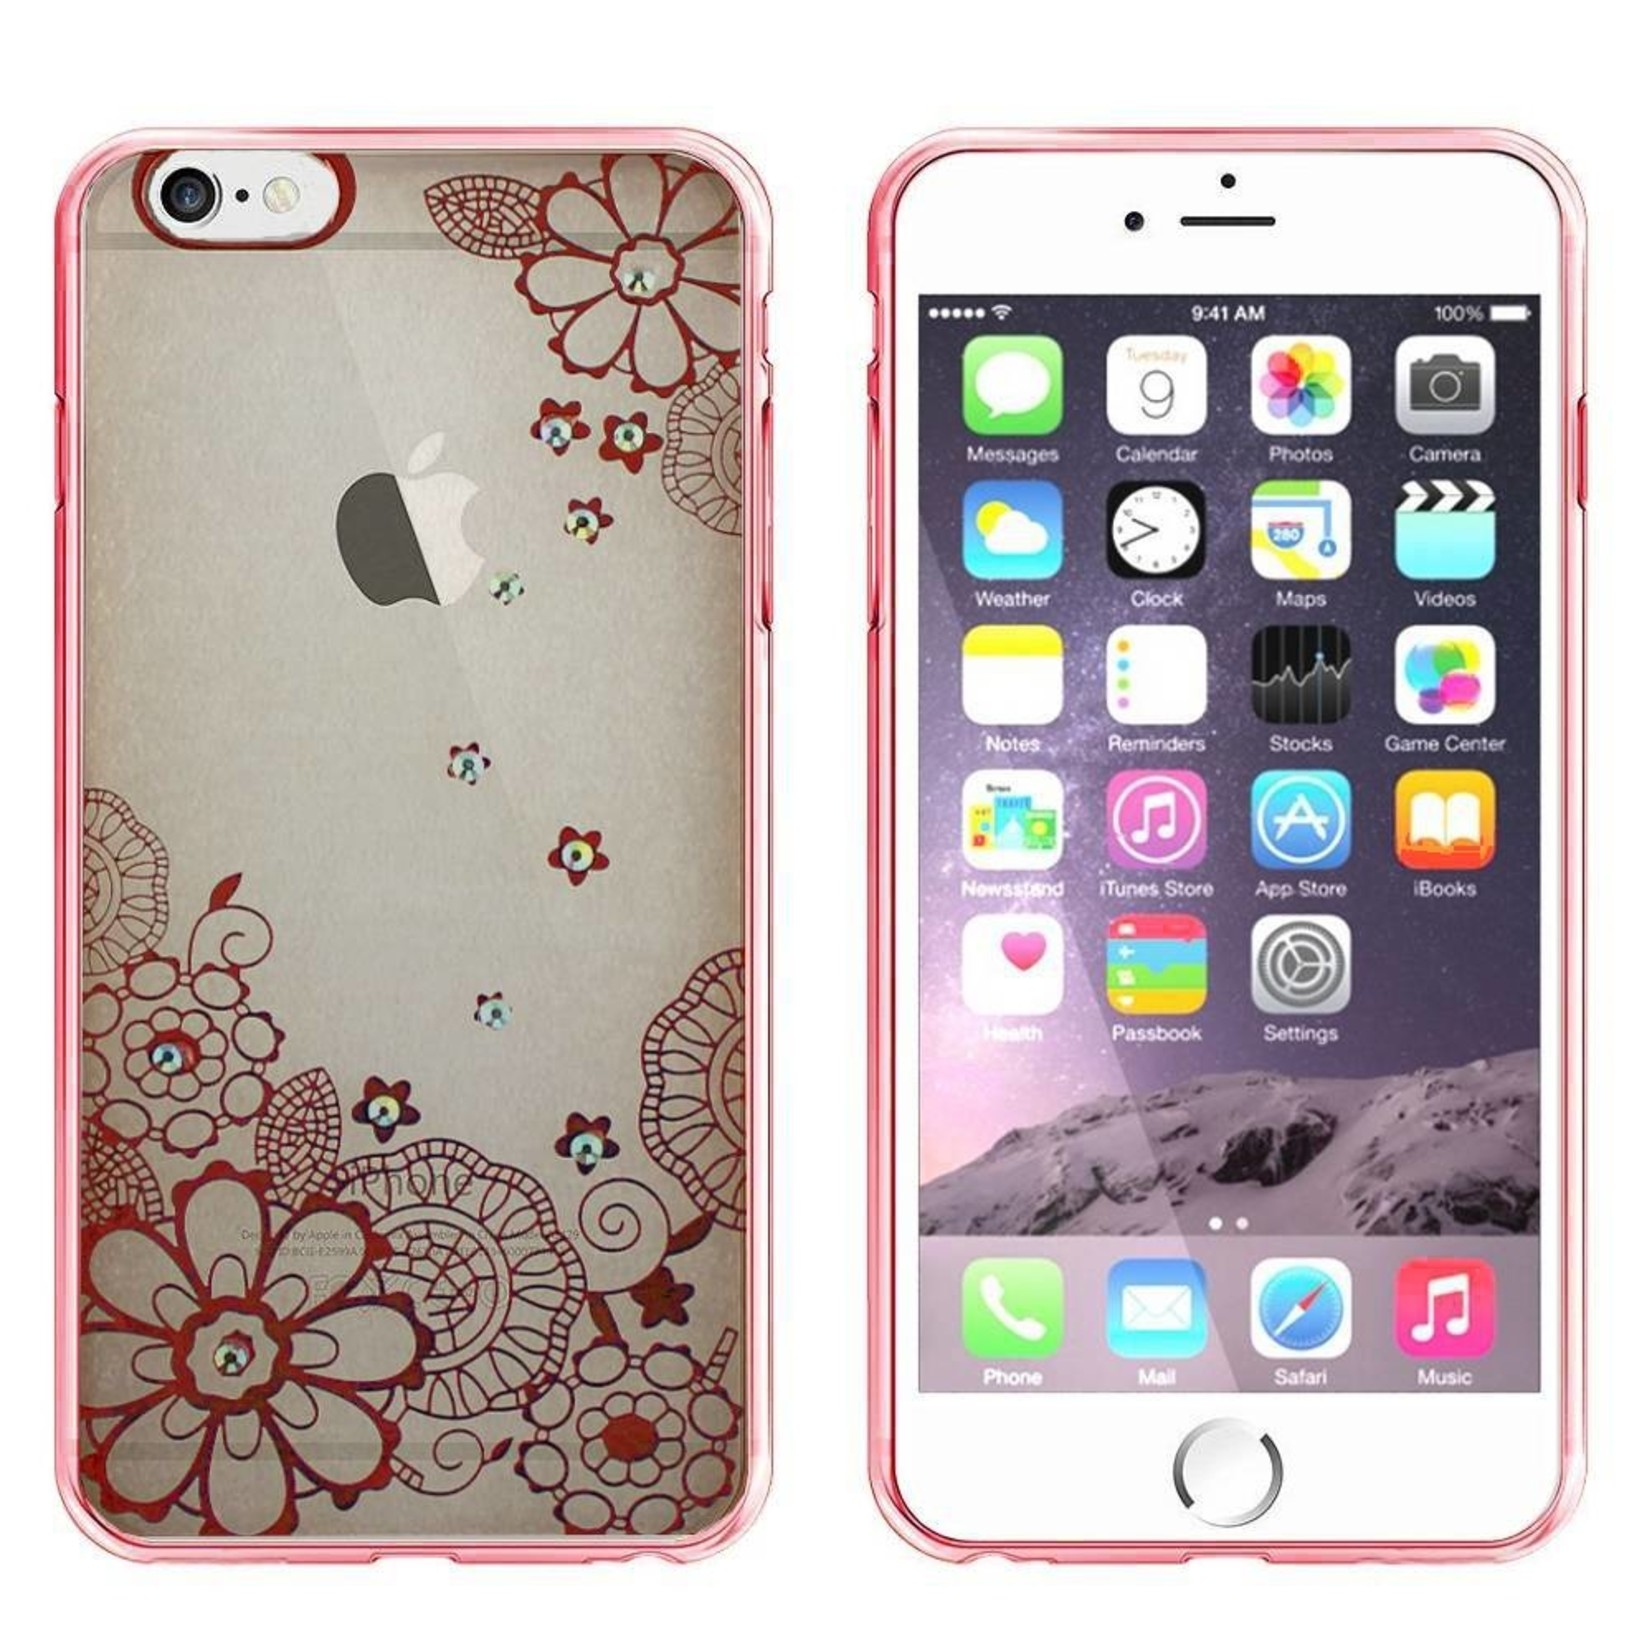 Colorfone Hoesje CoolSkin Bumper Clear Apple iPhone 5/5S/SE Flower Rosé Goud